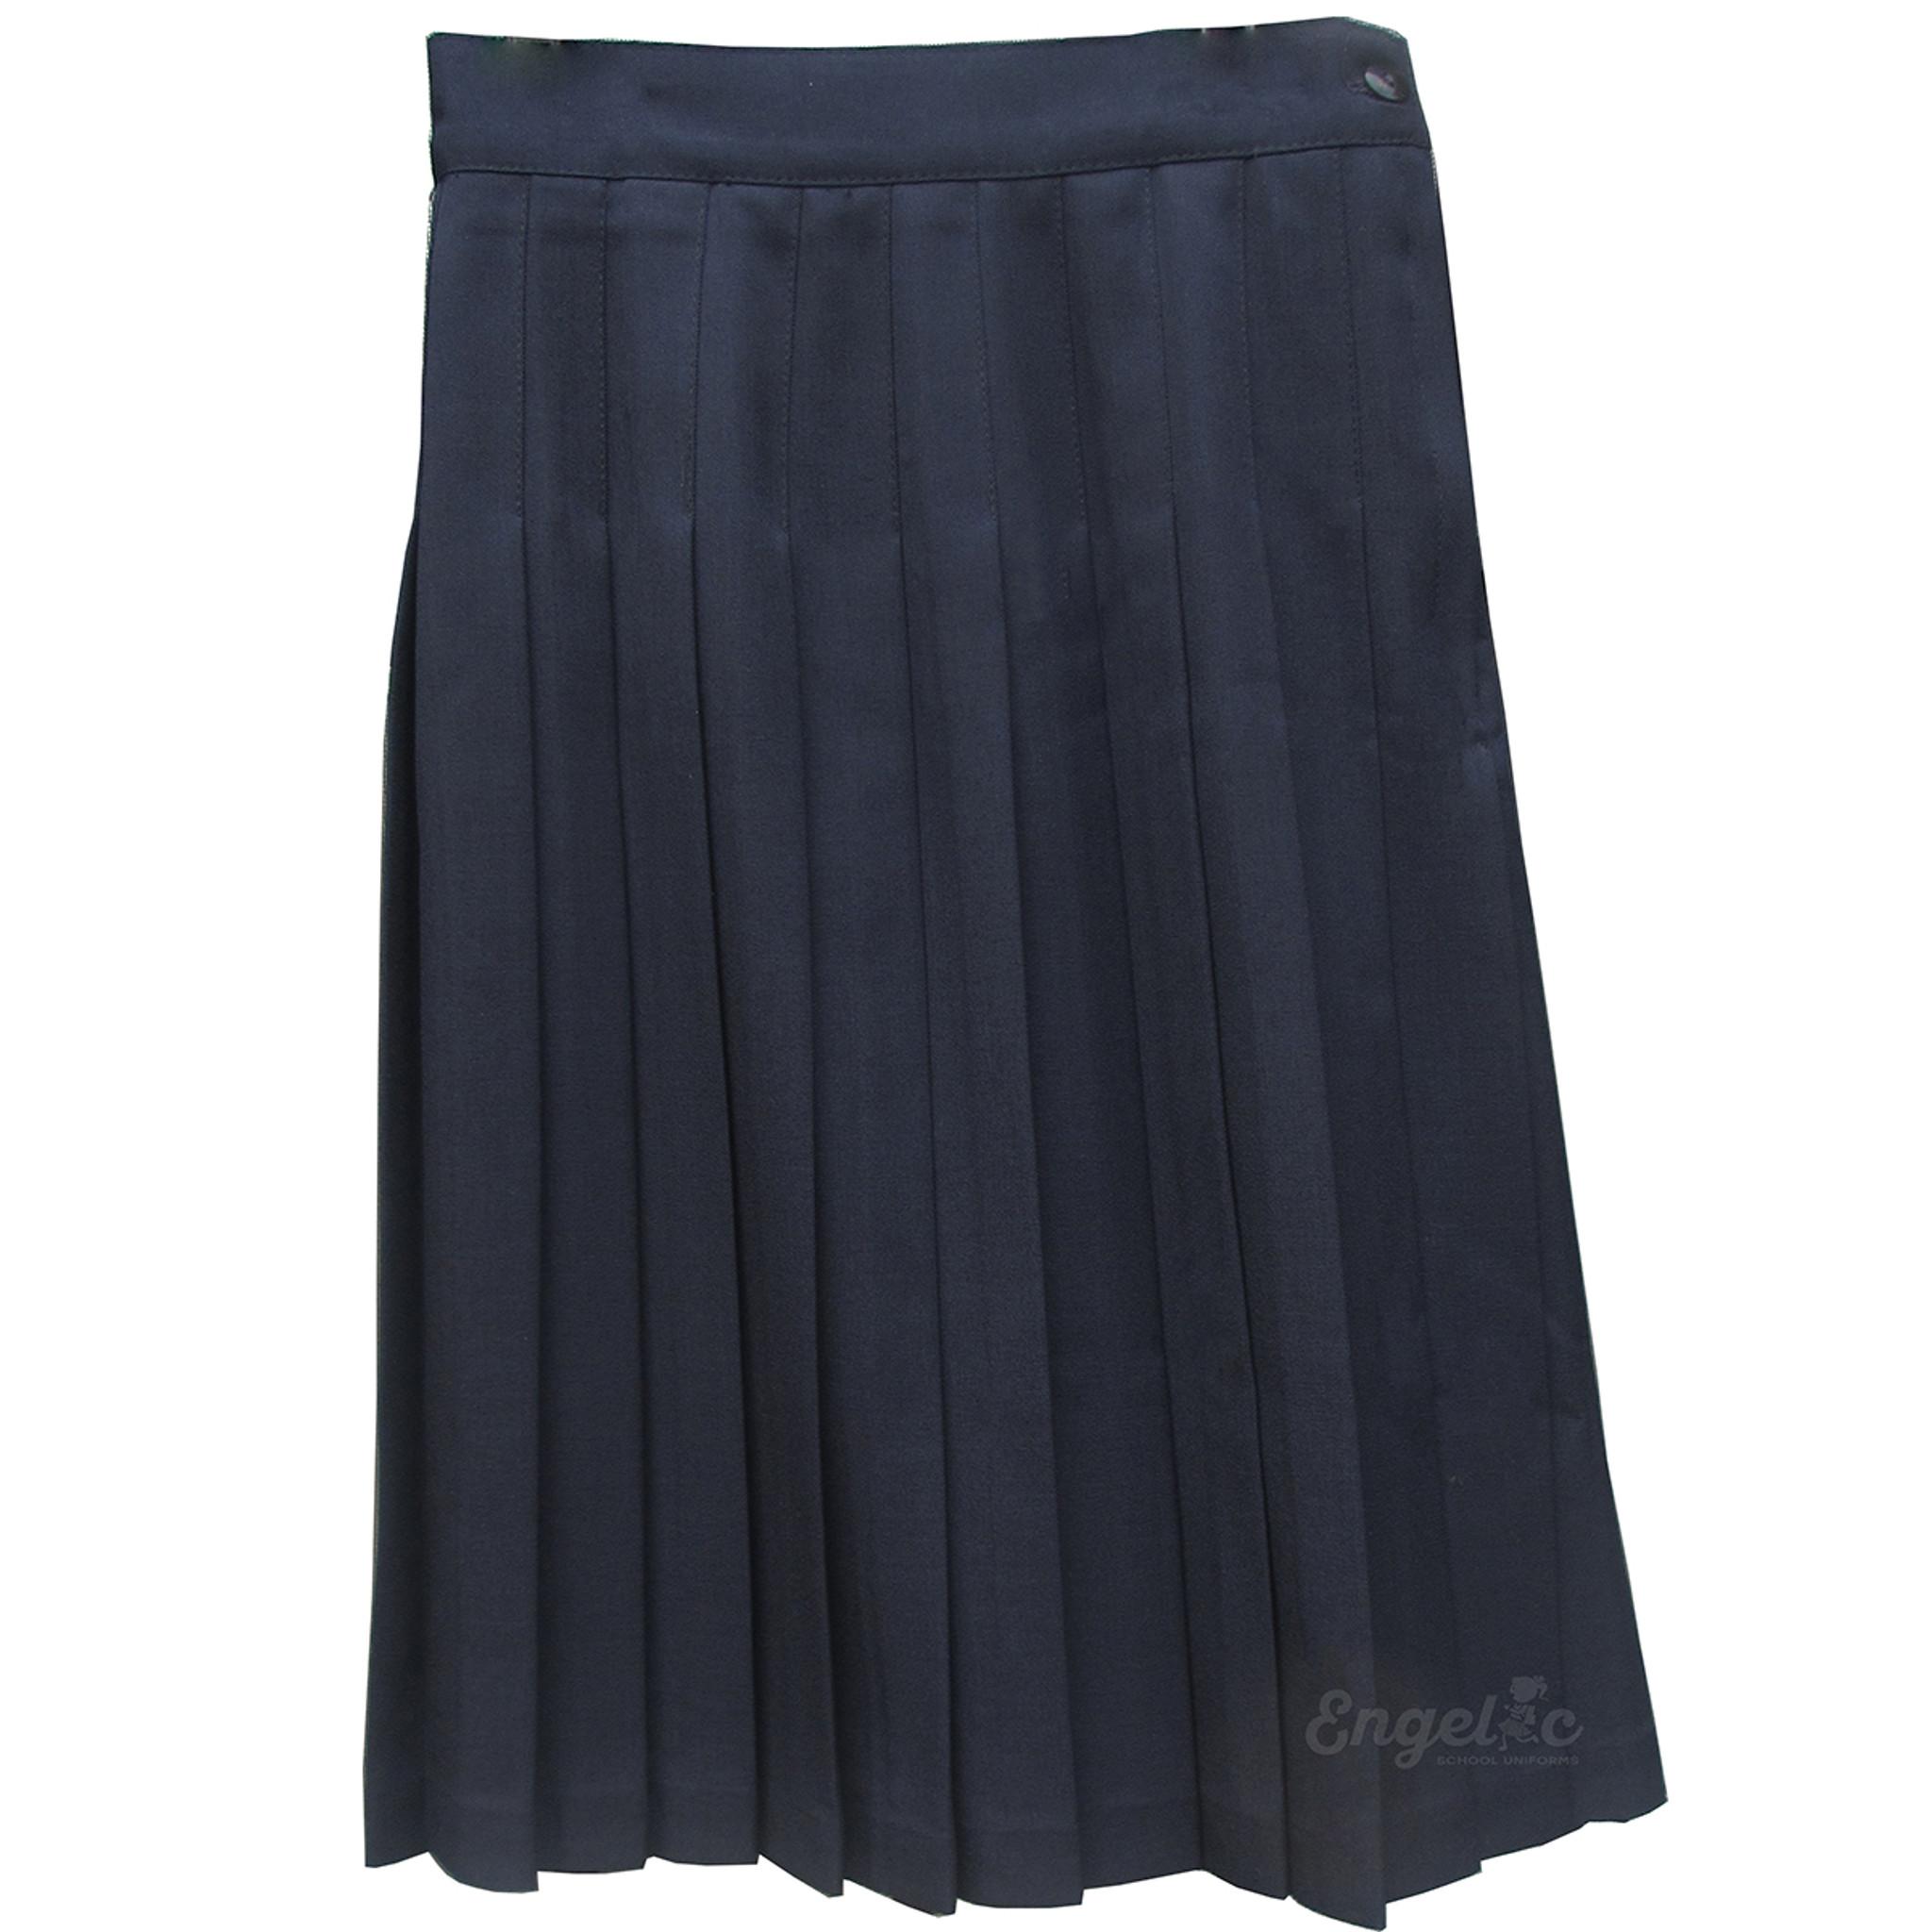 affd2eea0fd7d5 Girls School Uniform Pleated Skirt Poly/Wool - Engelic Uniforms